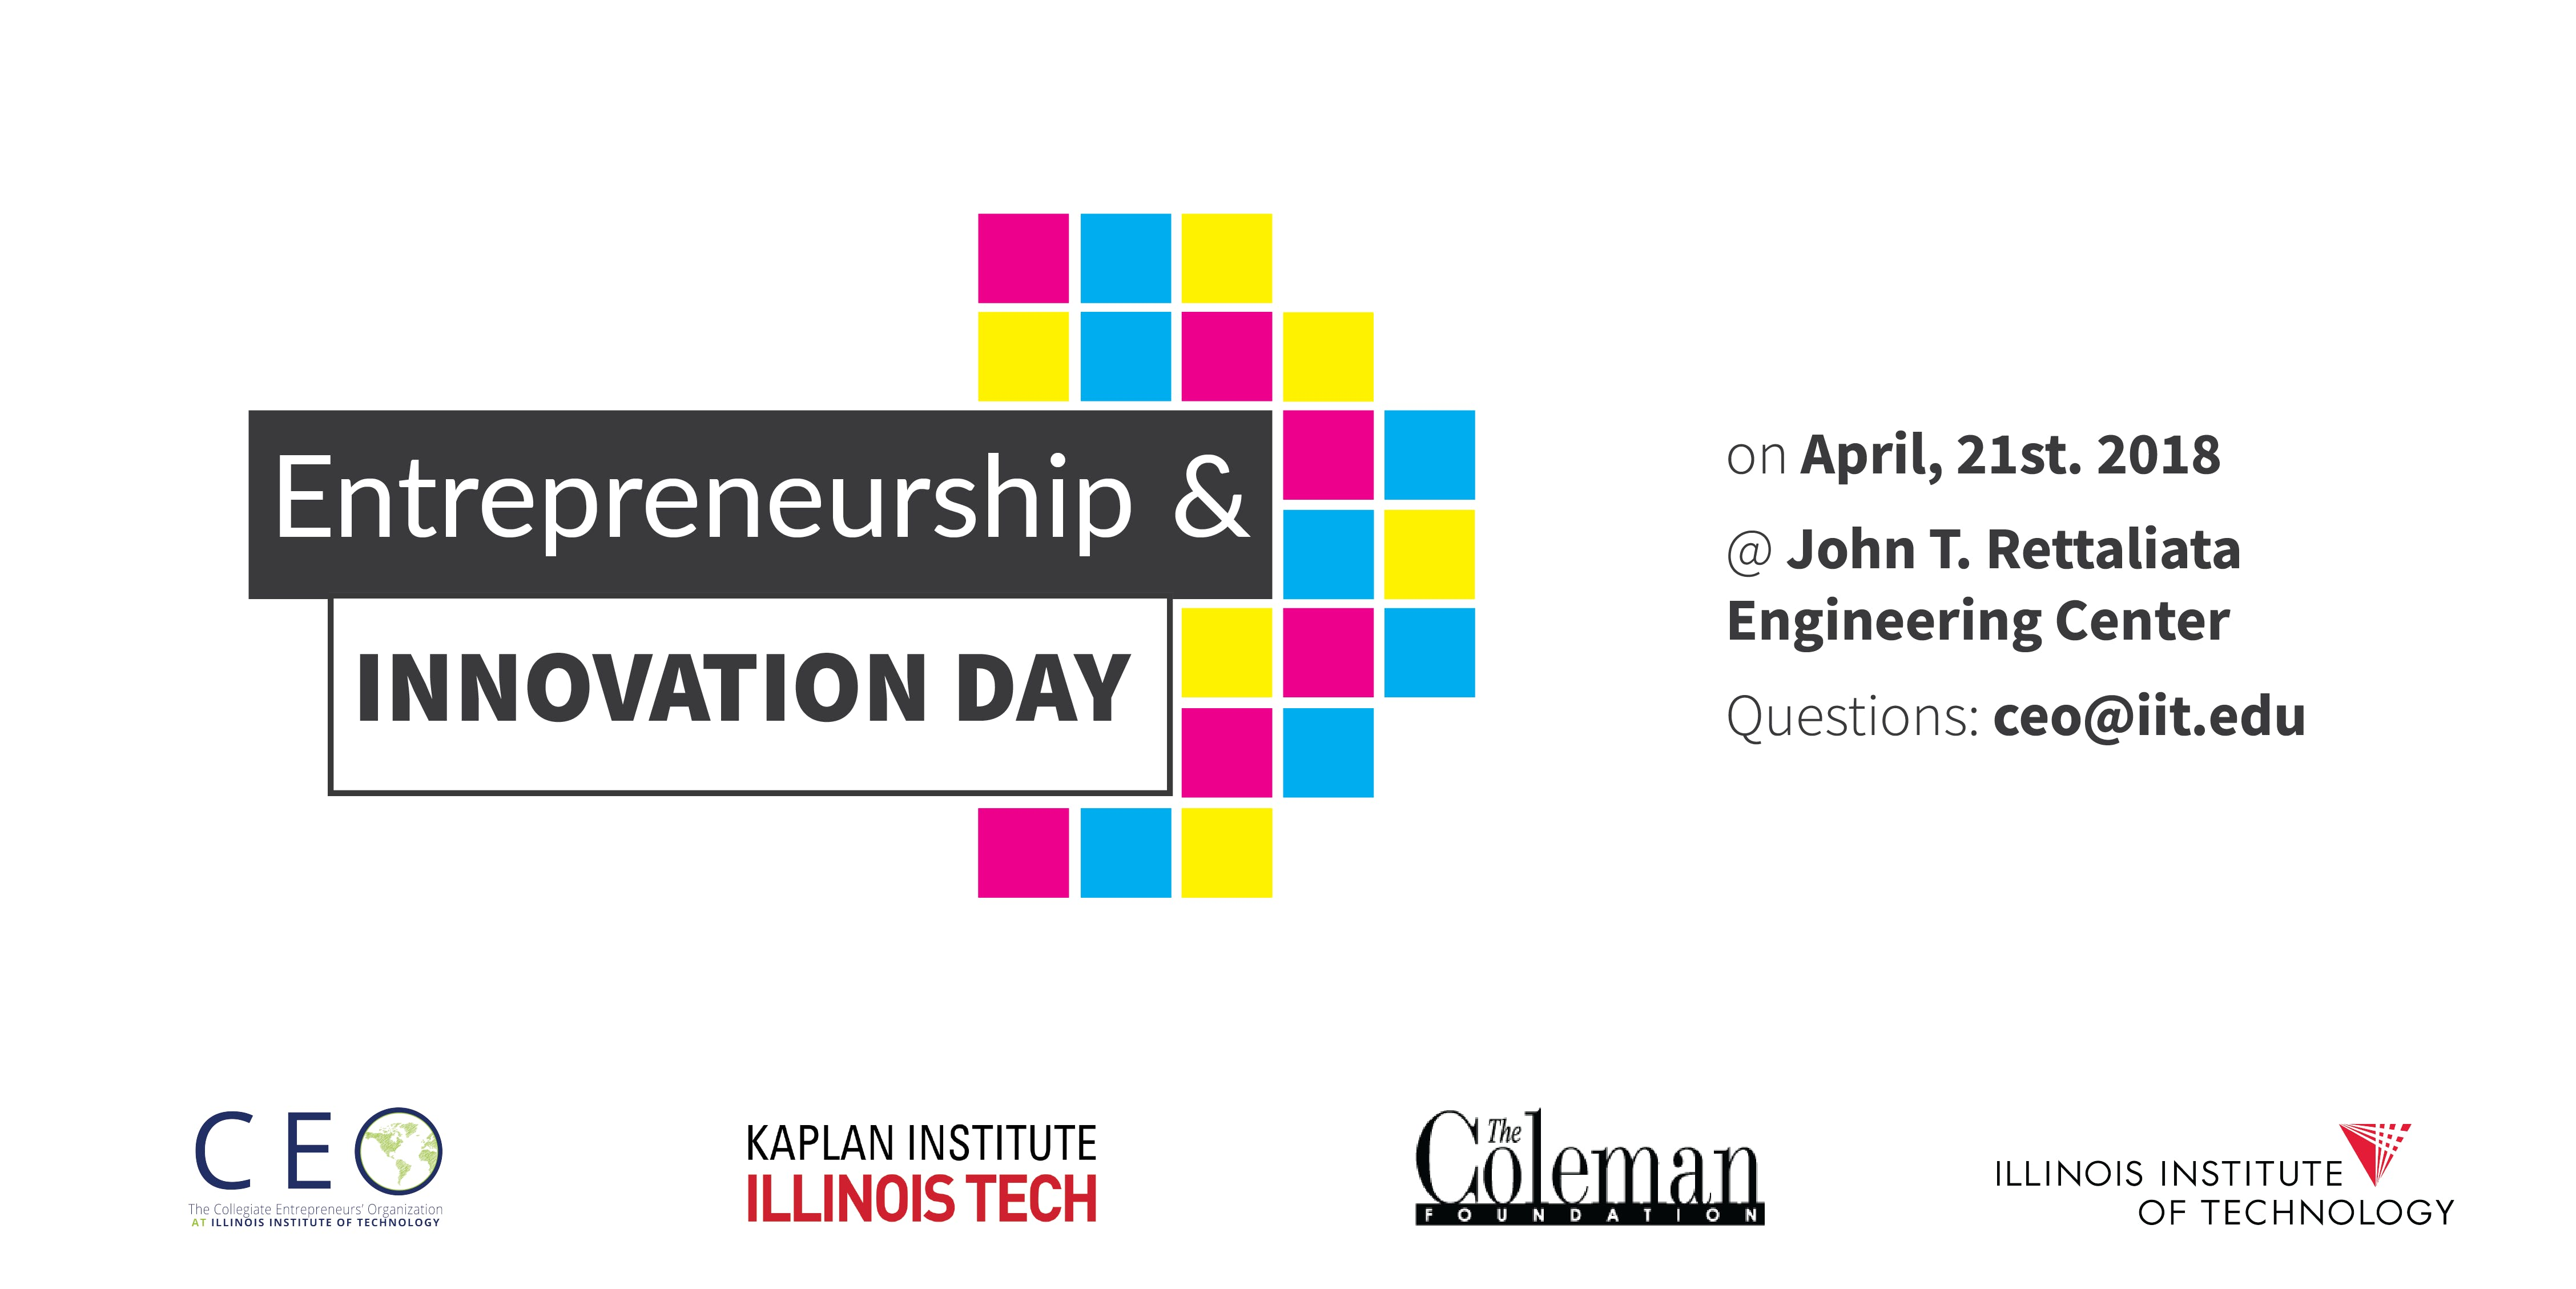 Entrepreneurship & Innovation Day